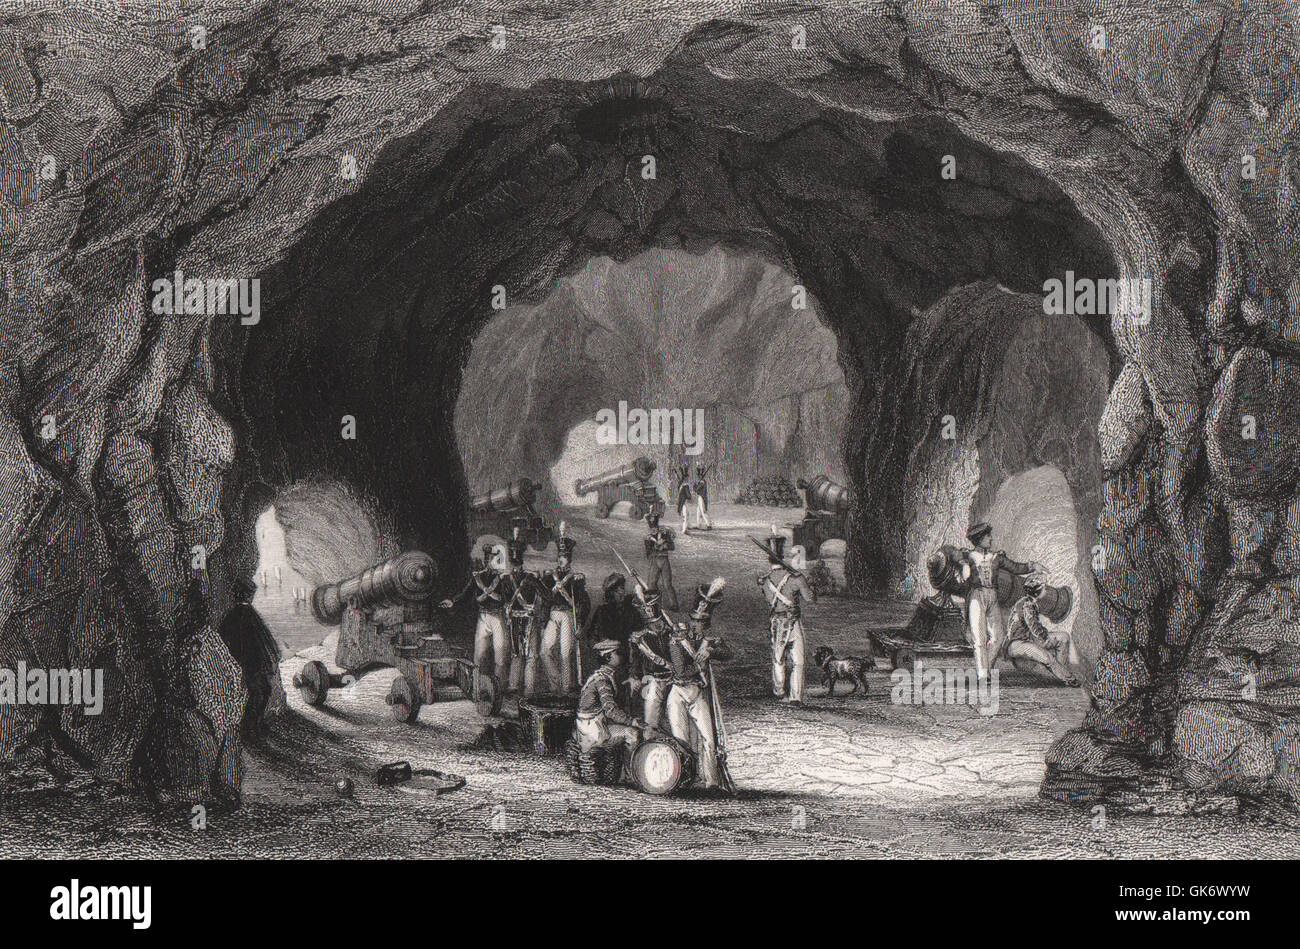 St. George's Hall, Gibraltar, antique print 1840 - Stock Image